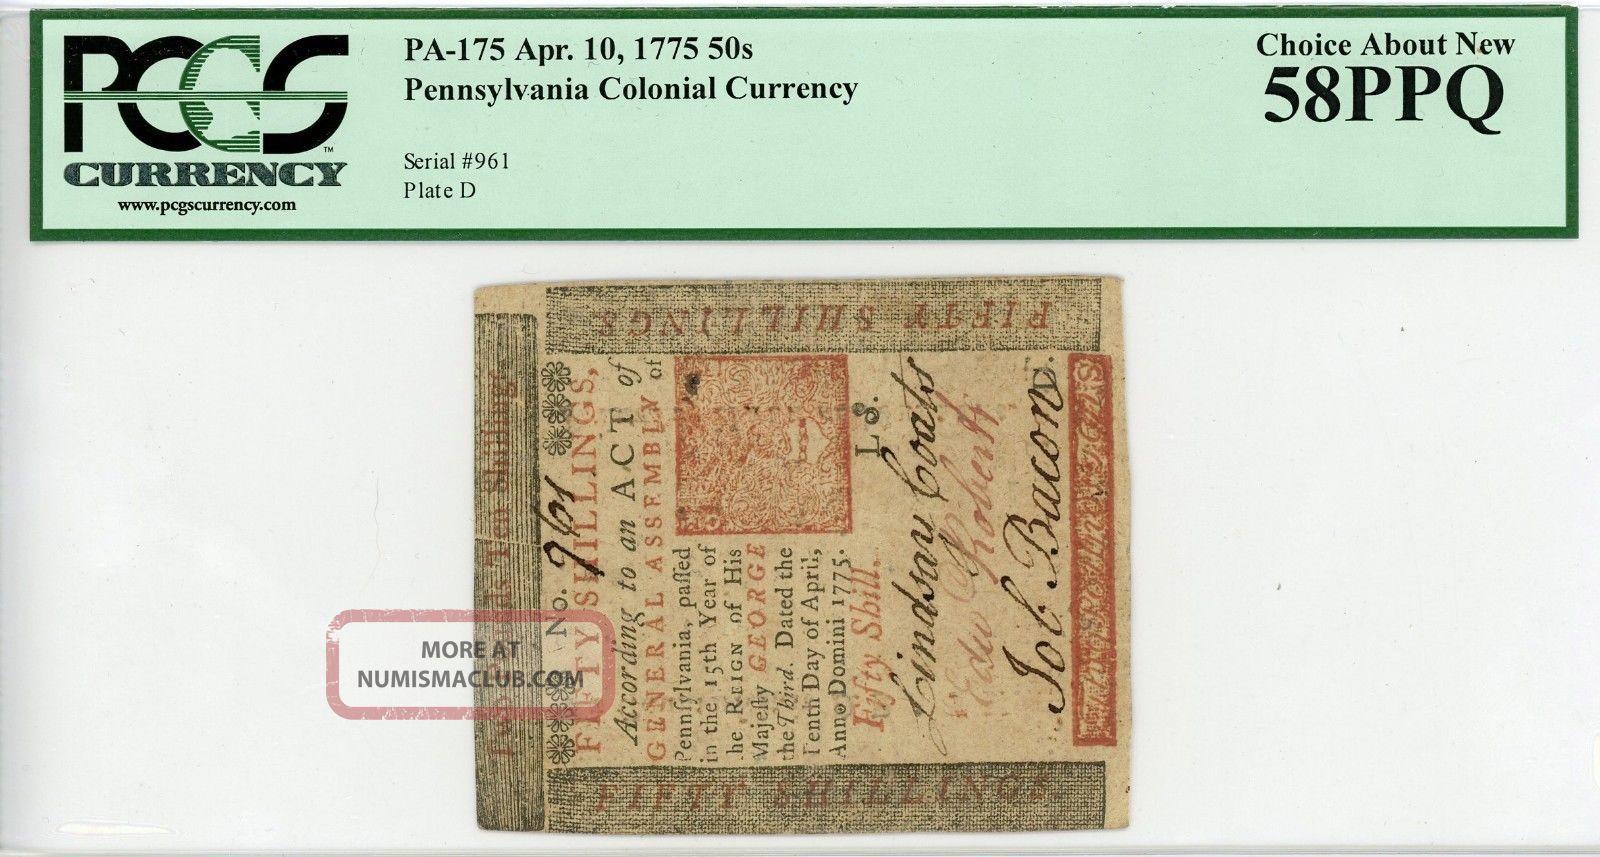 (pa - 175) April 10,  1775 50s Pennsylvania Colonial Currency - Pcgs Ch.  Au 58 Ppq Paper Money: US photo